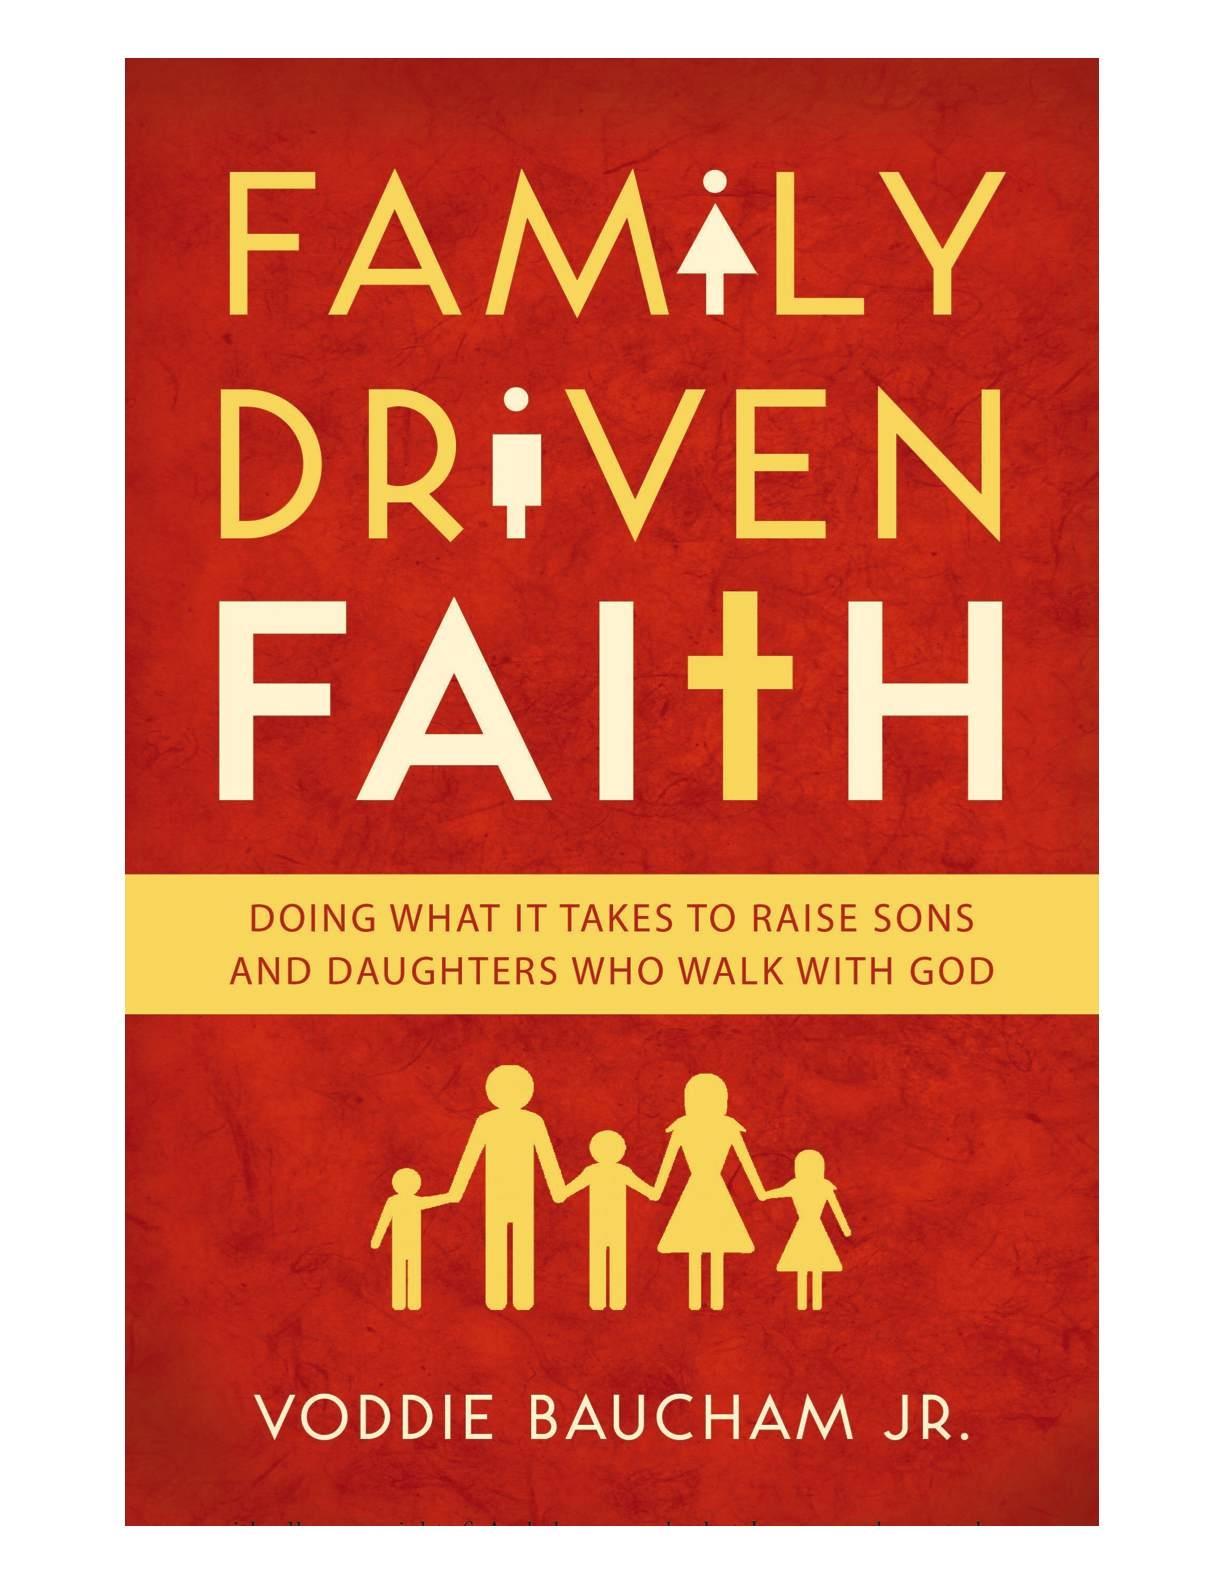 FamilyDrivenFaithBook.jpeg